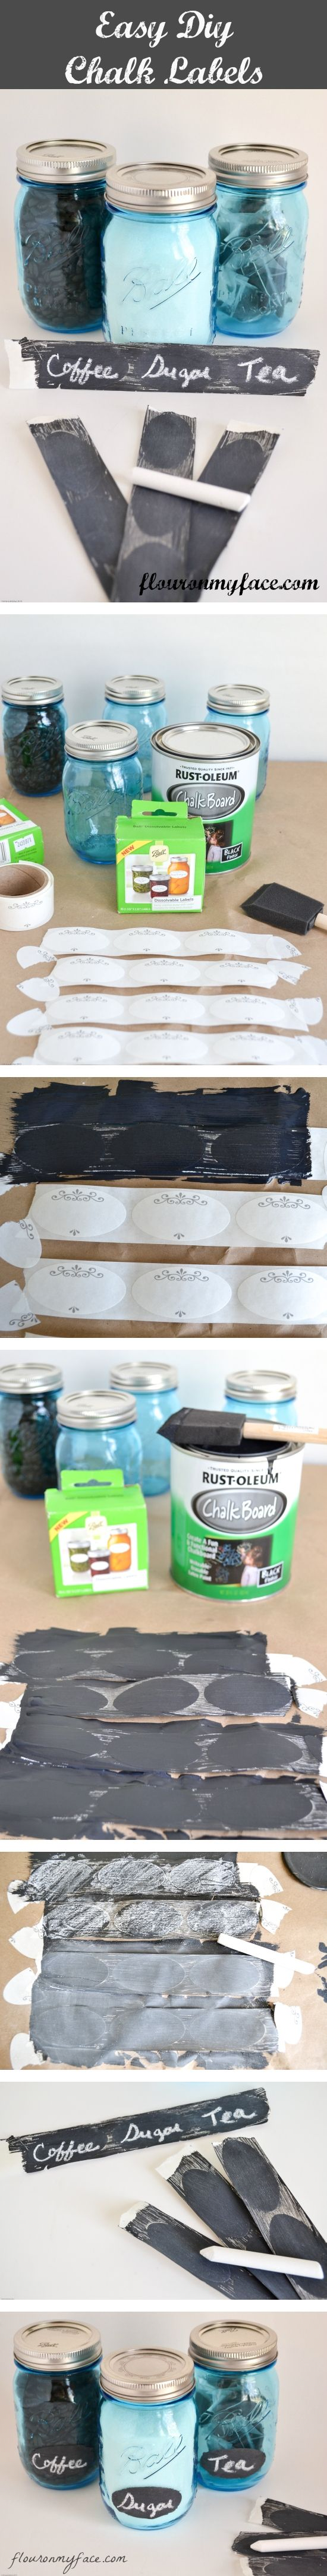 Easy DIY Chalkboard labels